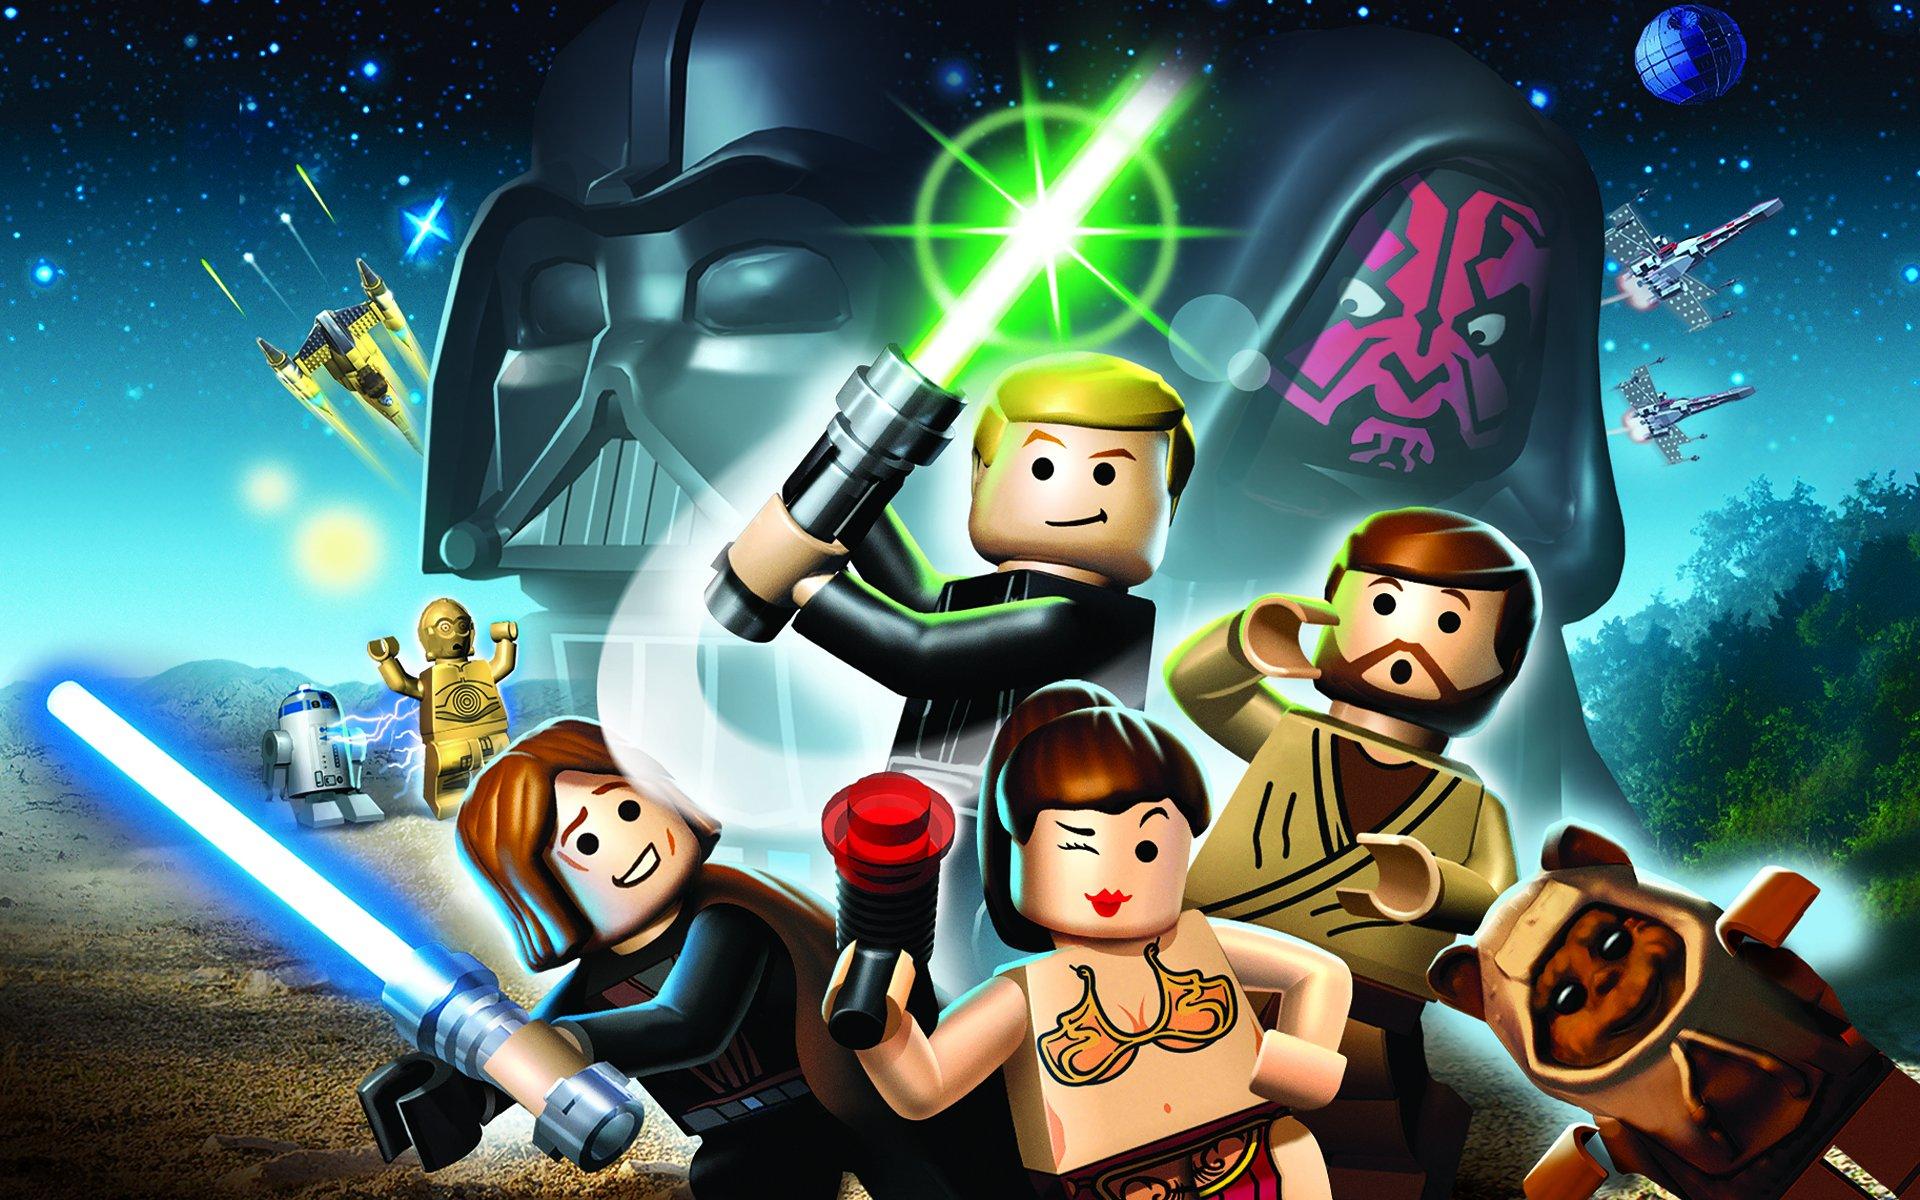 47 Star Wars Lego Desktop Wallpaper On Wallpapersafari